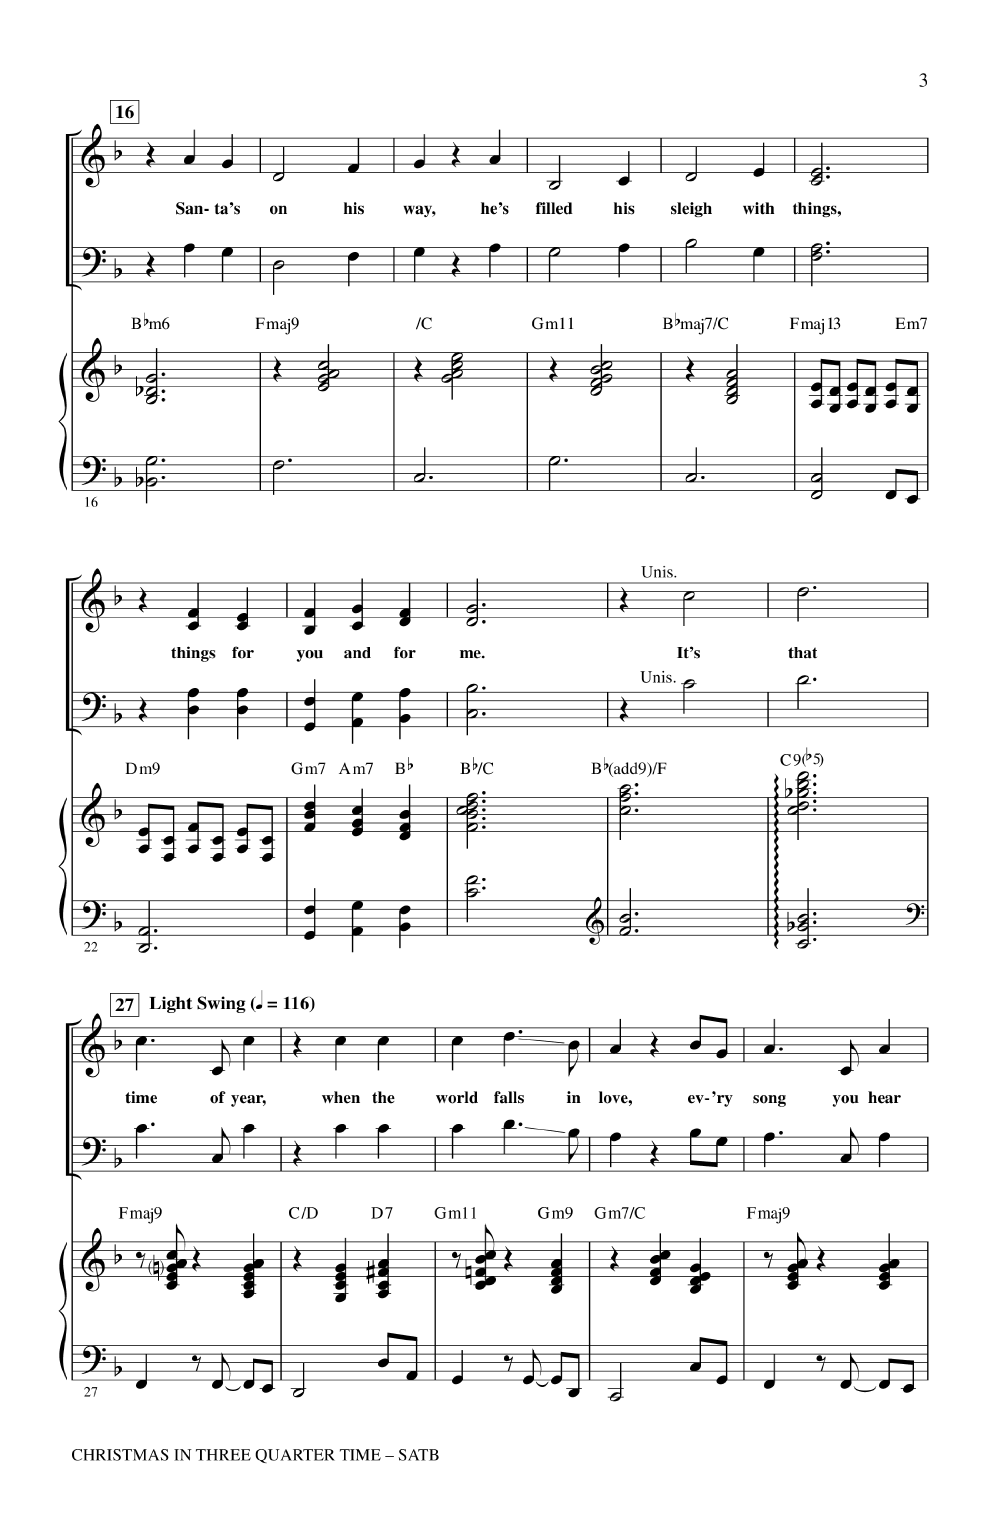 Christmas in Three-Quarter Time (SATB ) arr. | J.W. Pepper Sheet Music